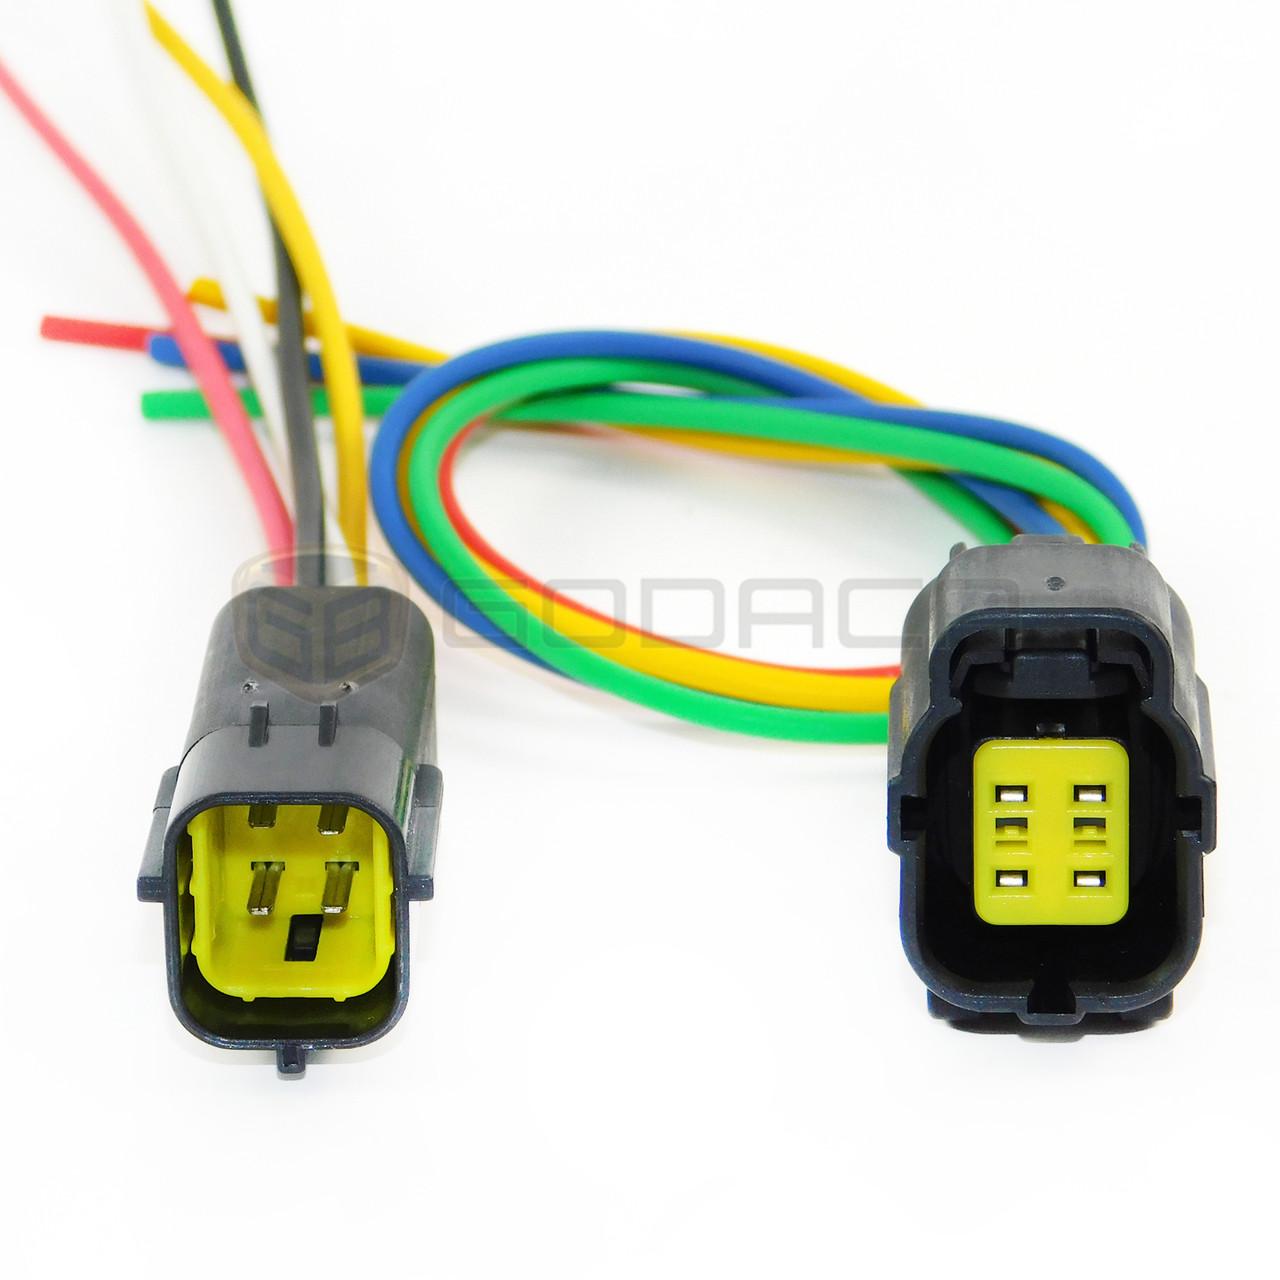 1 x female male connector harness pigtail o2 oxygen sensor chevrolet ford honda godaca llc  [ 1280 x 1280 Pixel ]